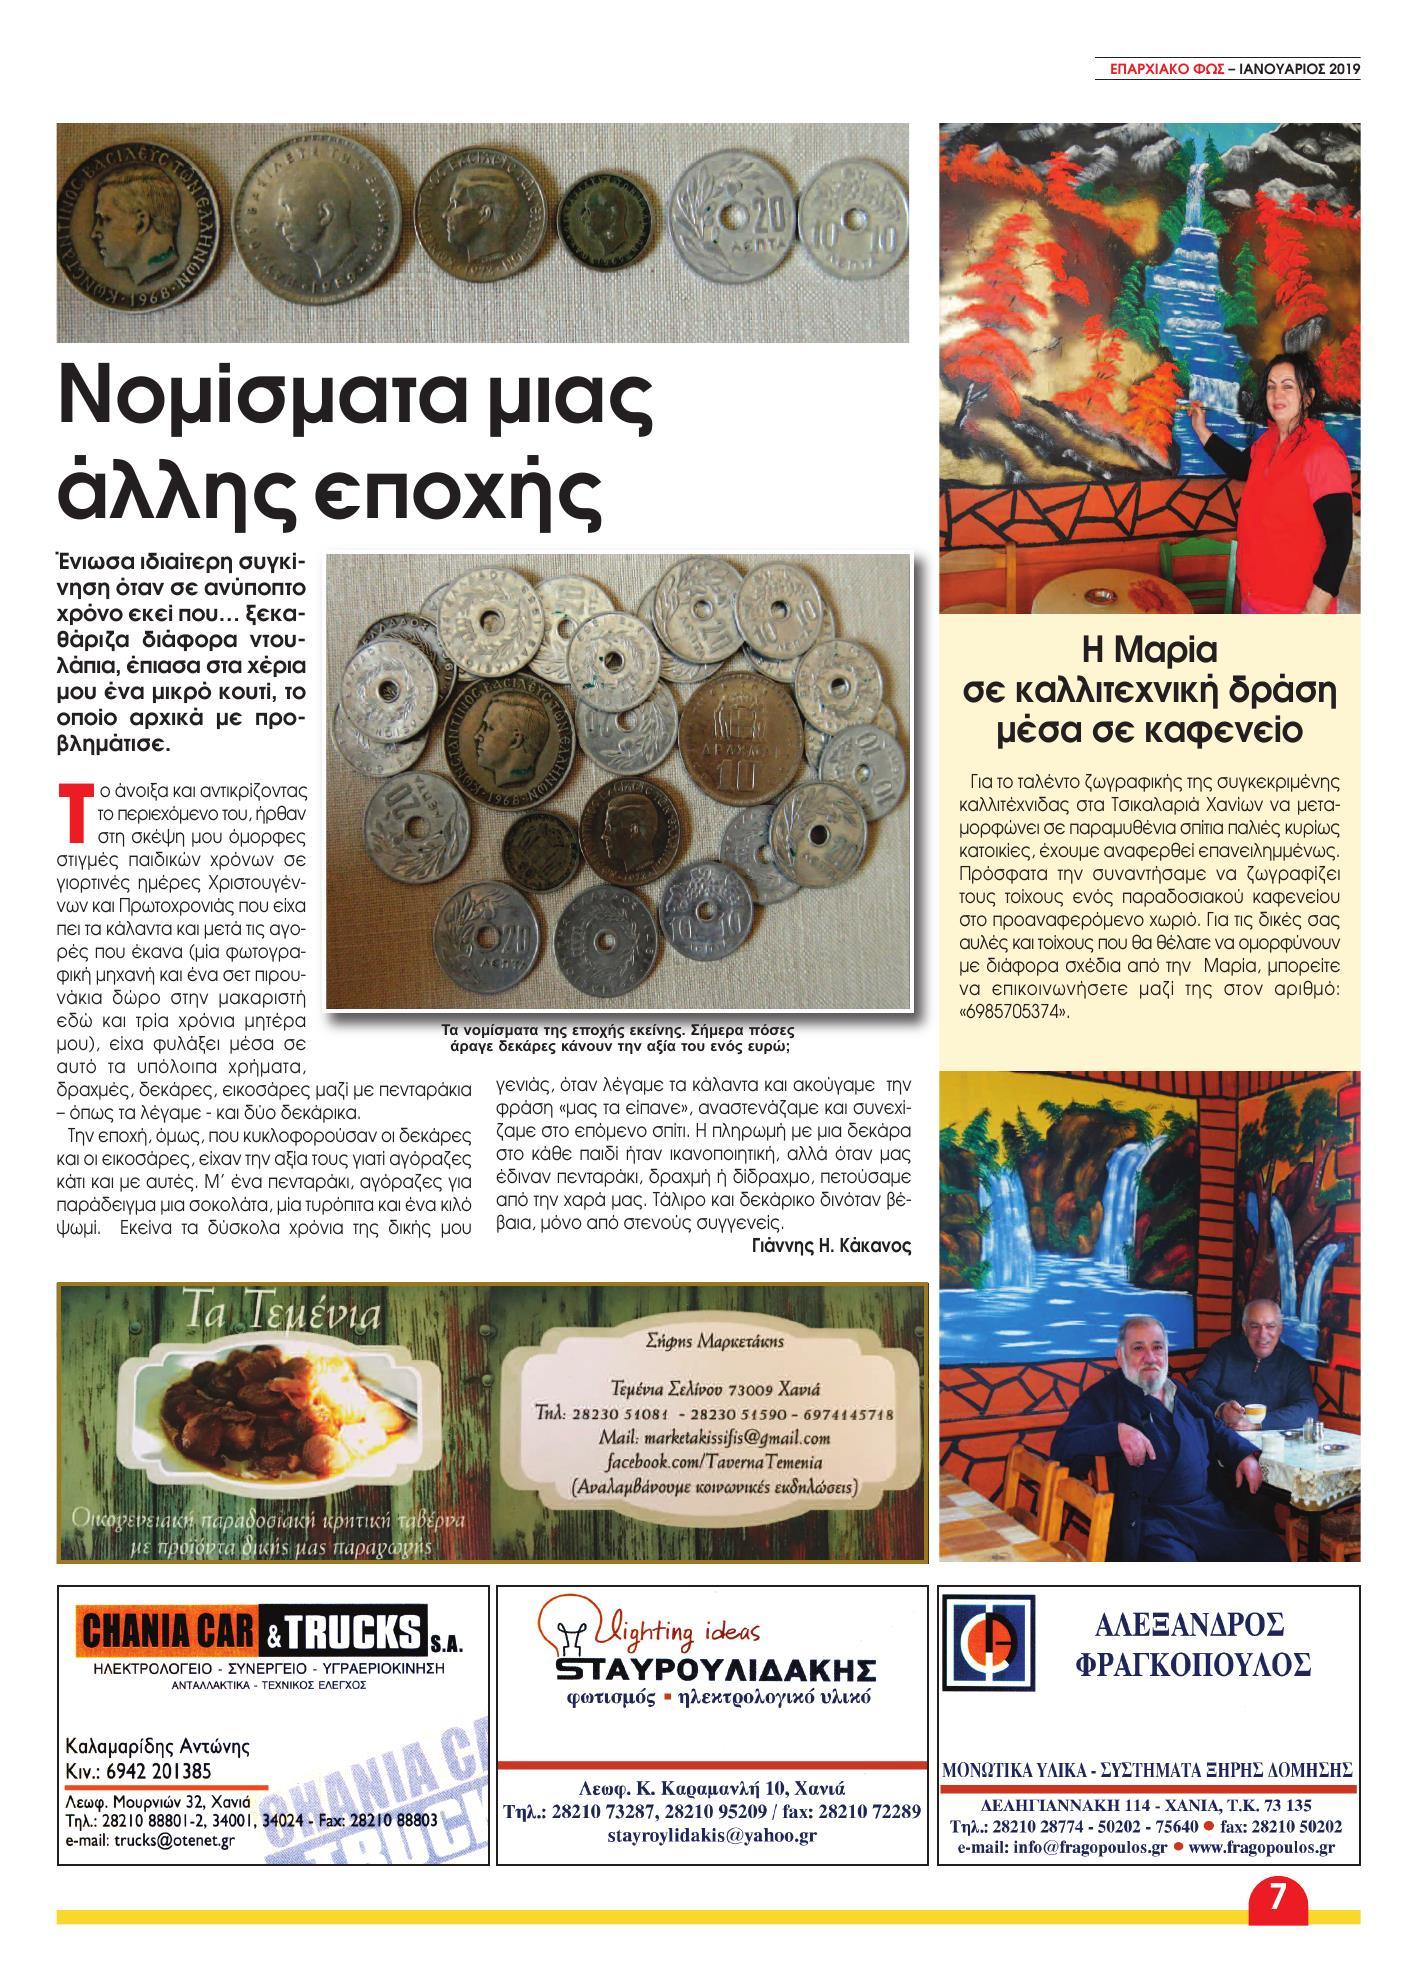 23 KAKANOULHS (Page 07)